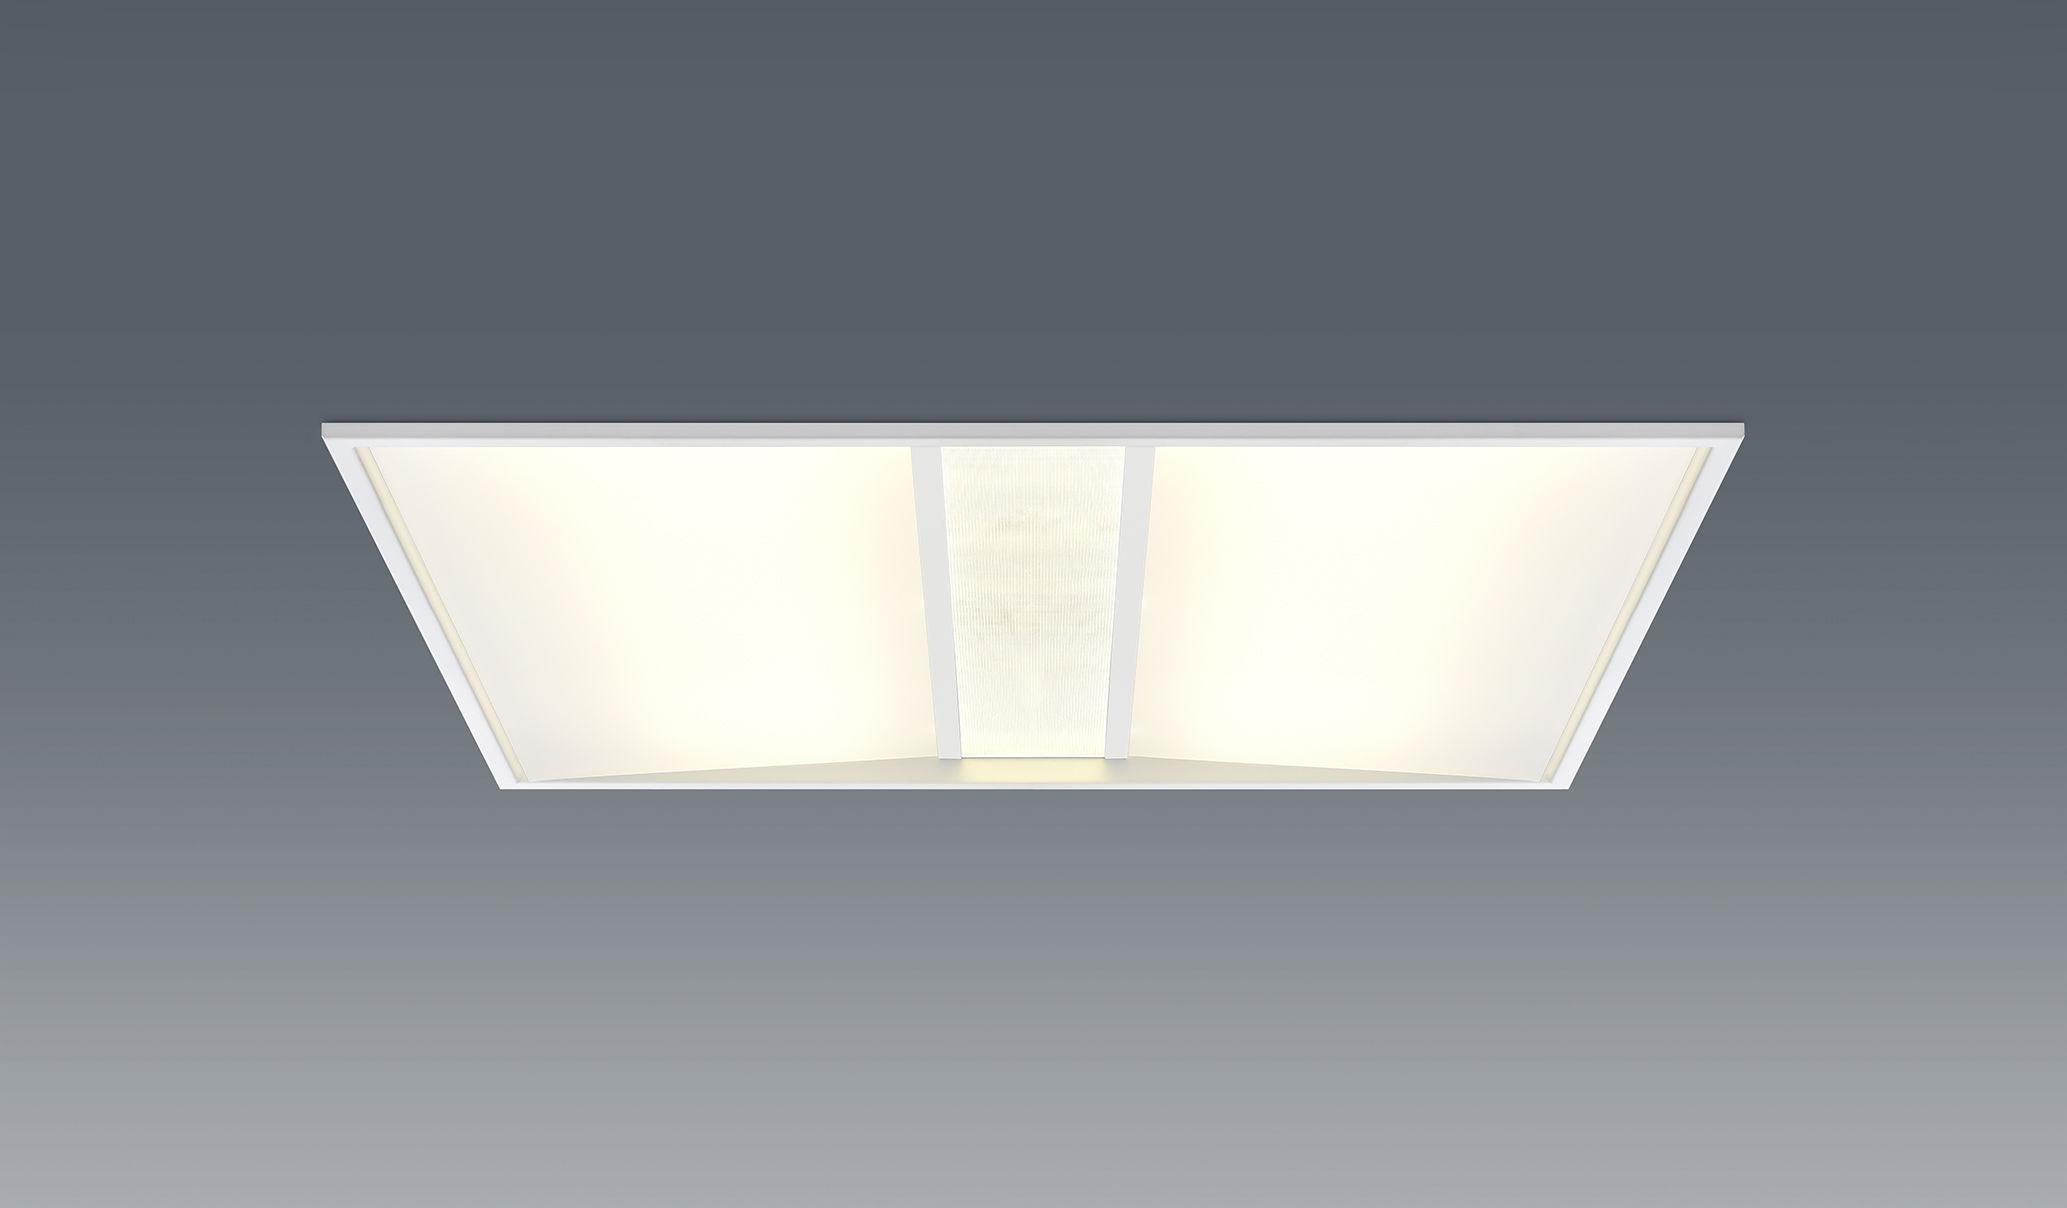 Recessed Ceiling Light Fixture Led Square Steel